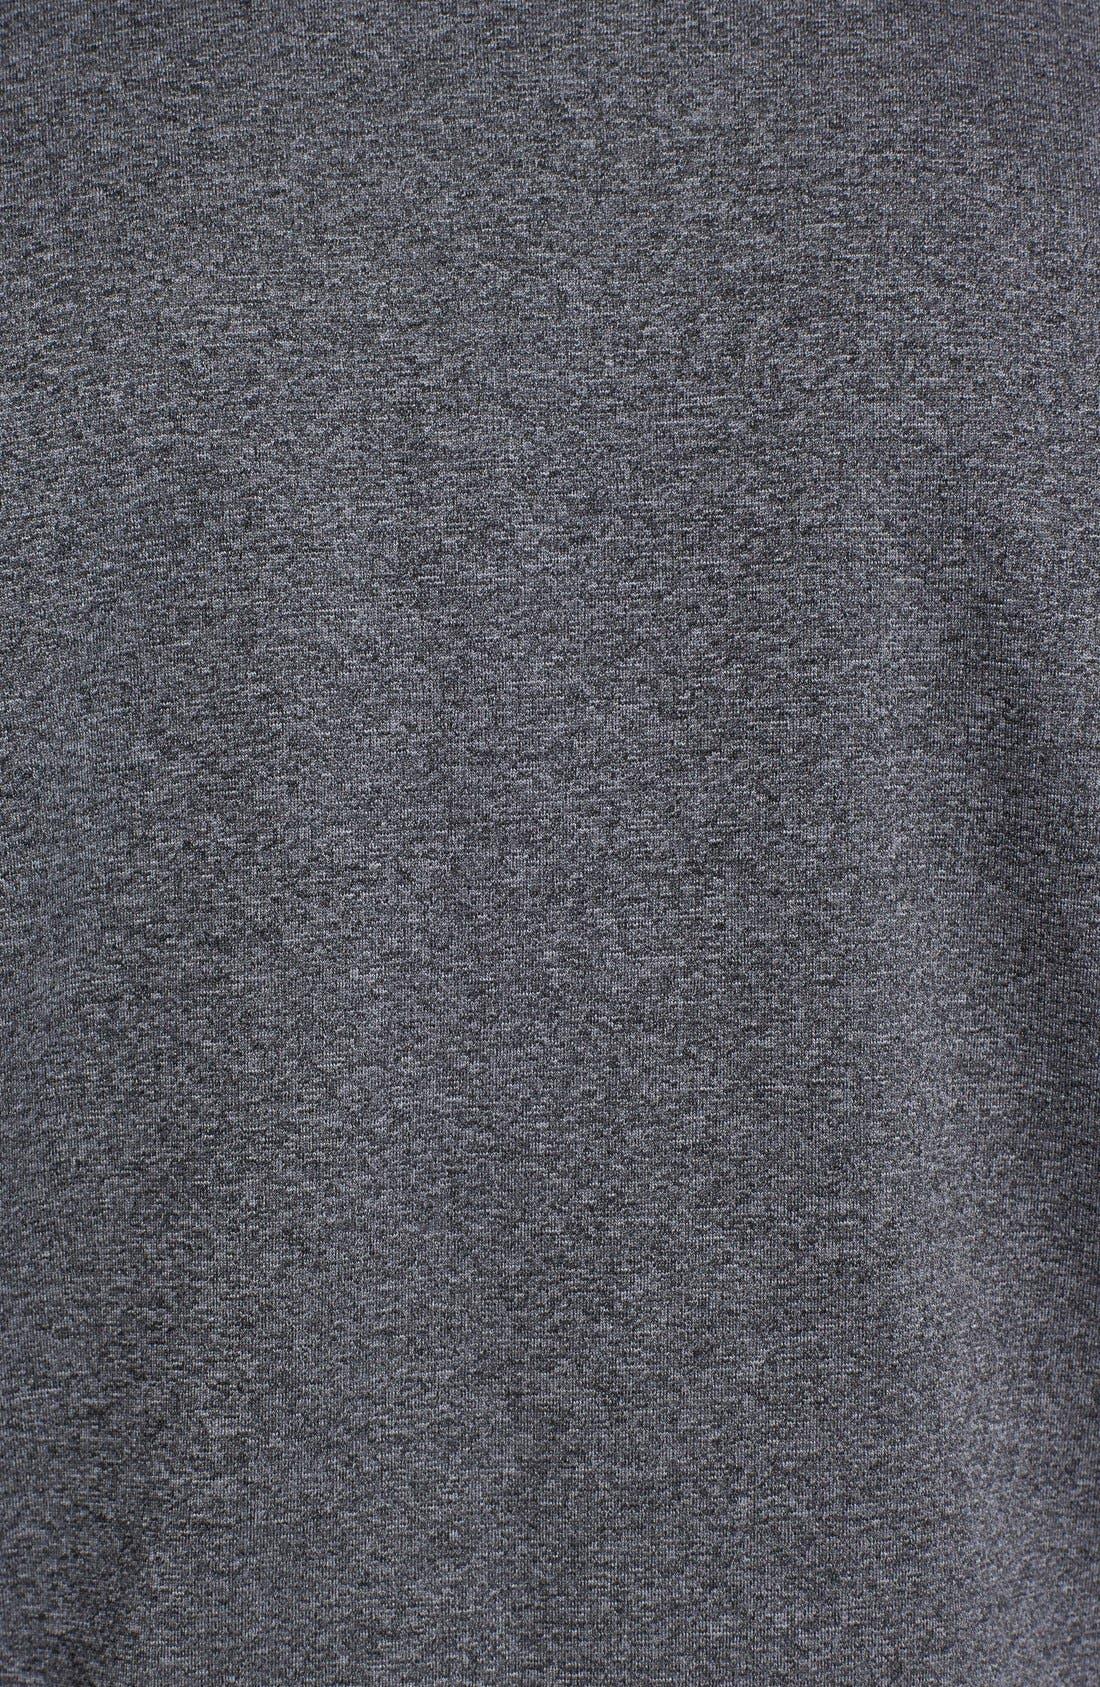 Alternate Image 3  - The North Face 'Canyonlands' Jacket